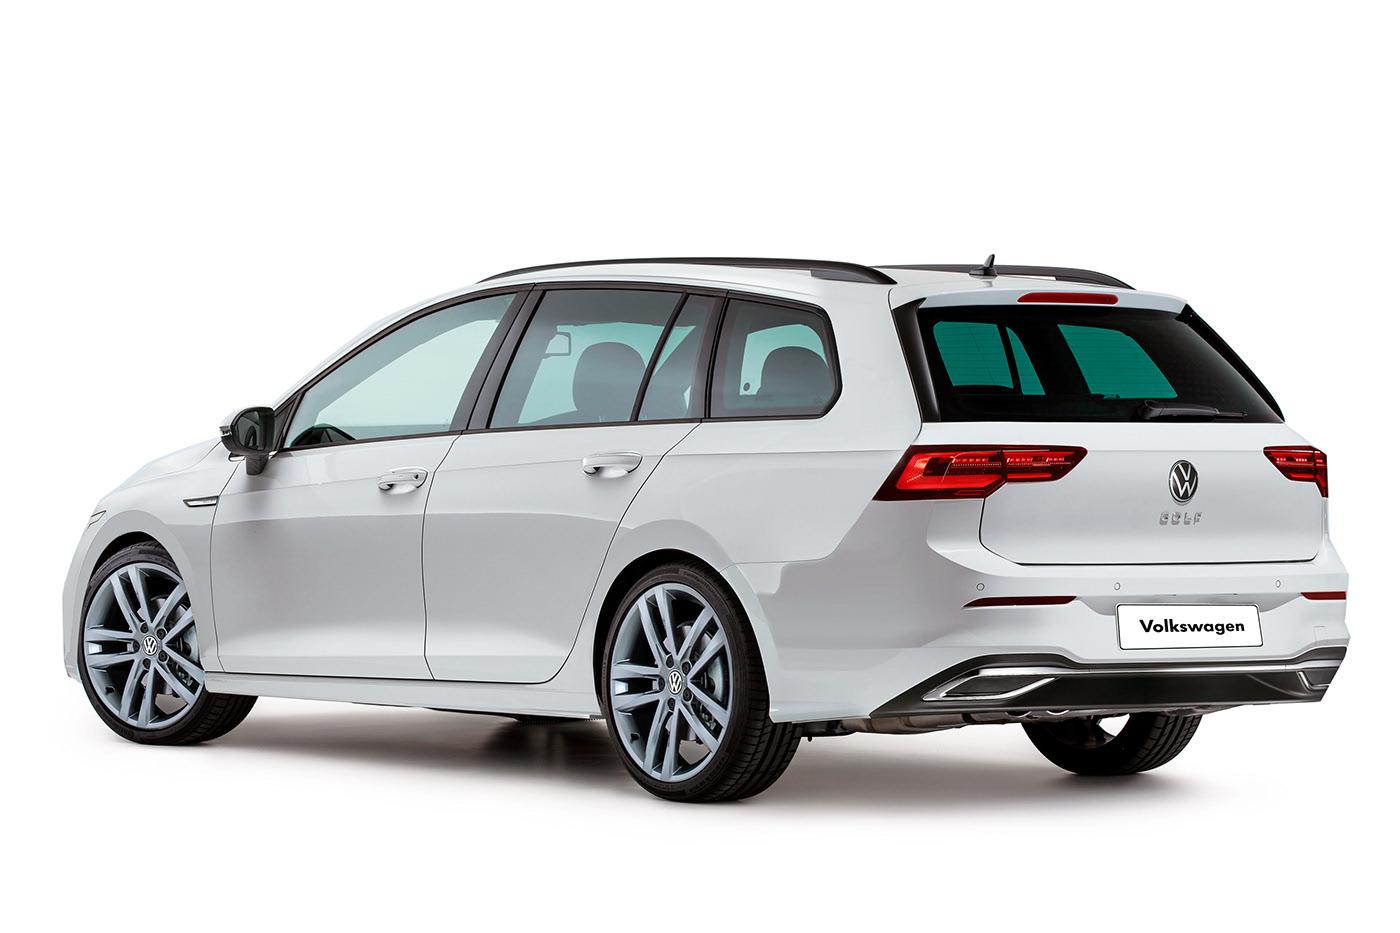 2021 Volkswagen Golf Sportwagen Pricing